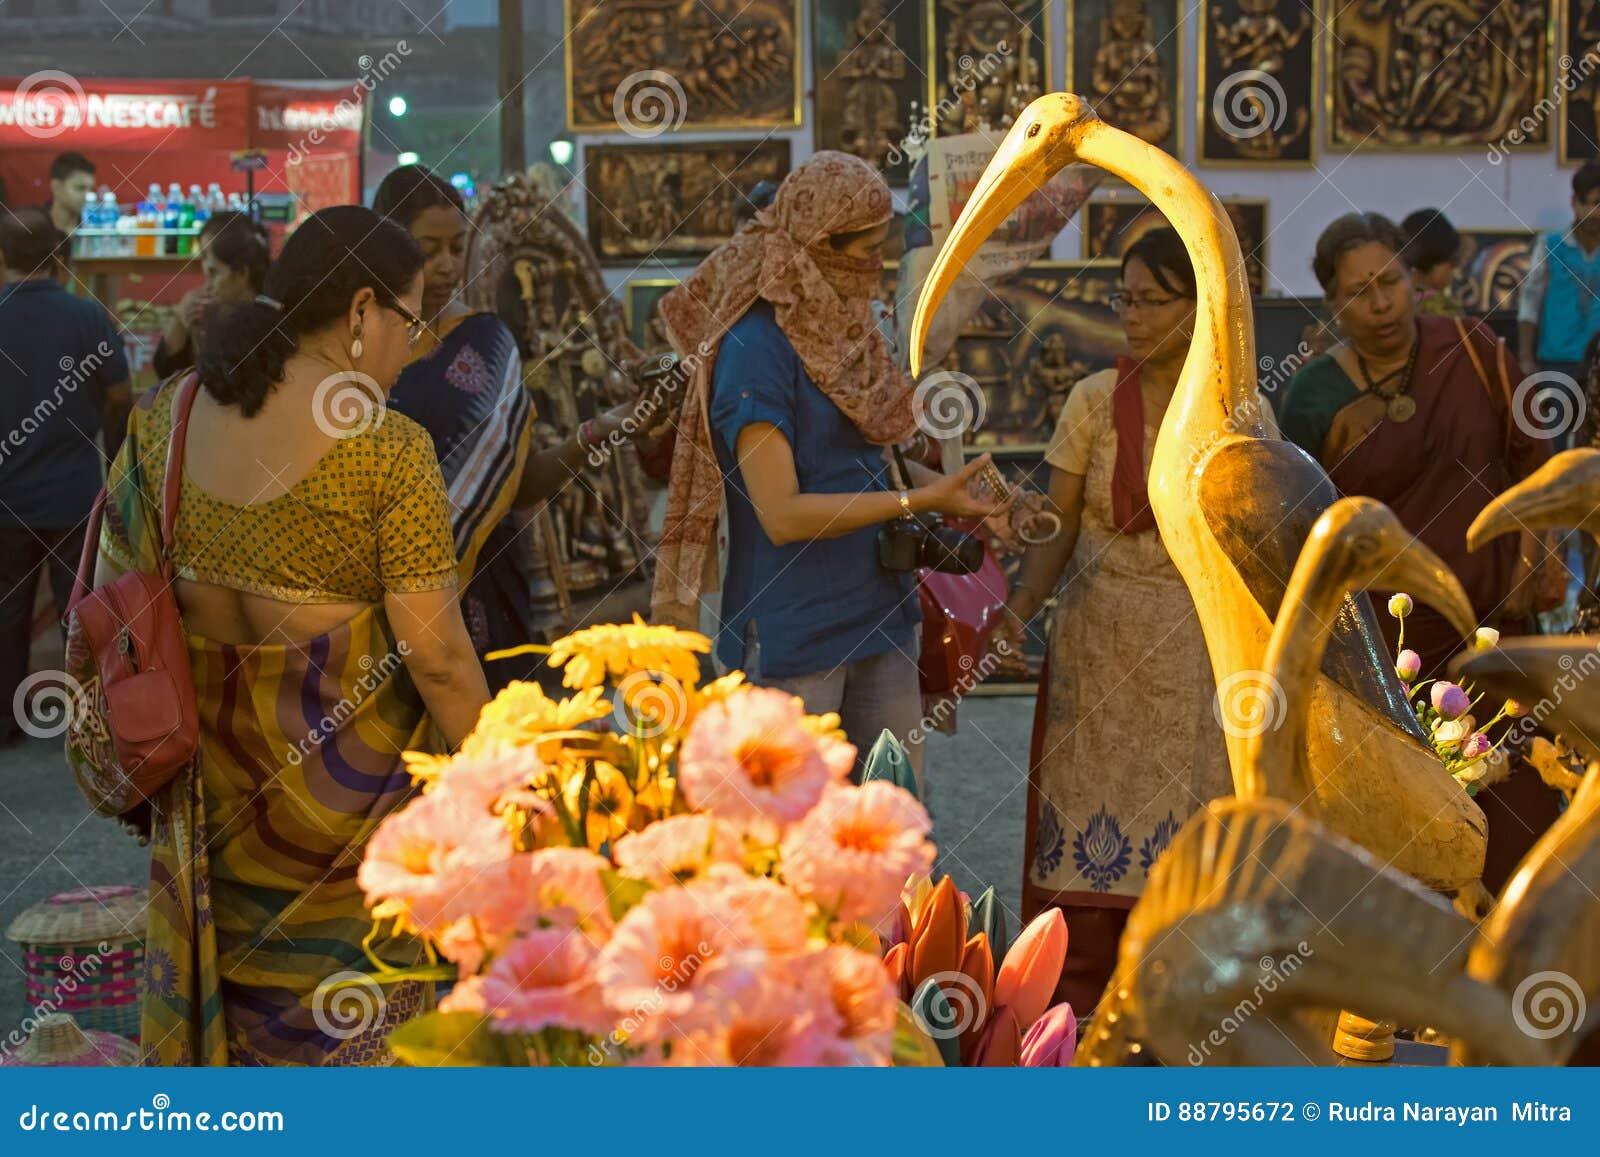 Wood Made Handicraft Items On Display Kolkata Editorial